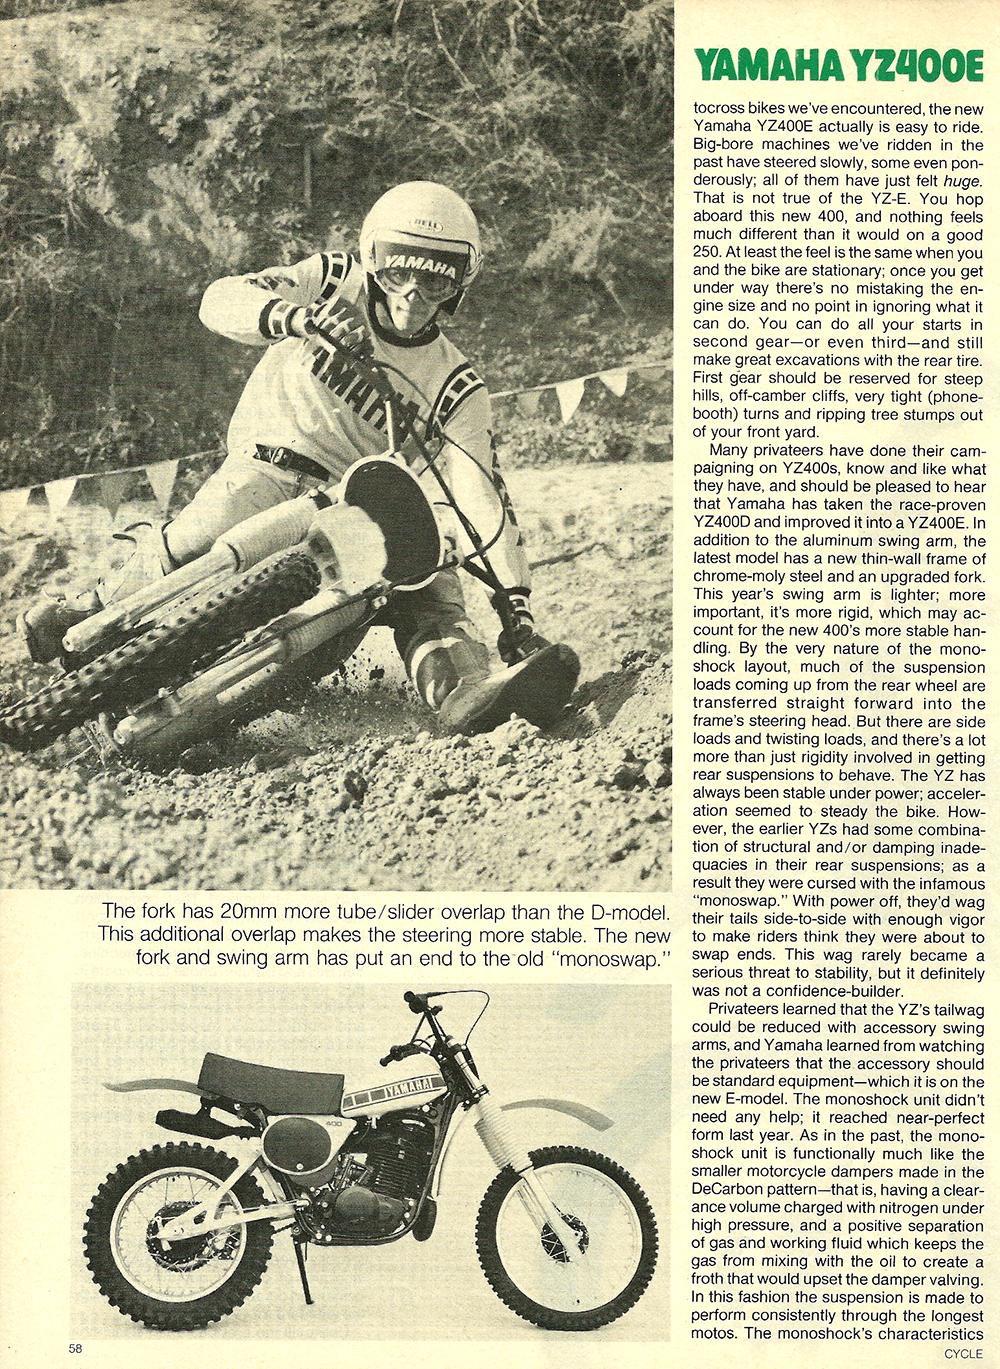 1978 Yamaha YZ400E road test 3.jpg